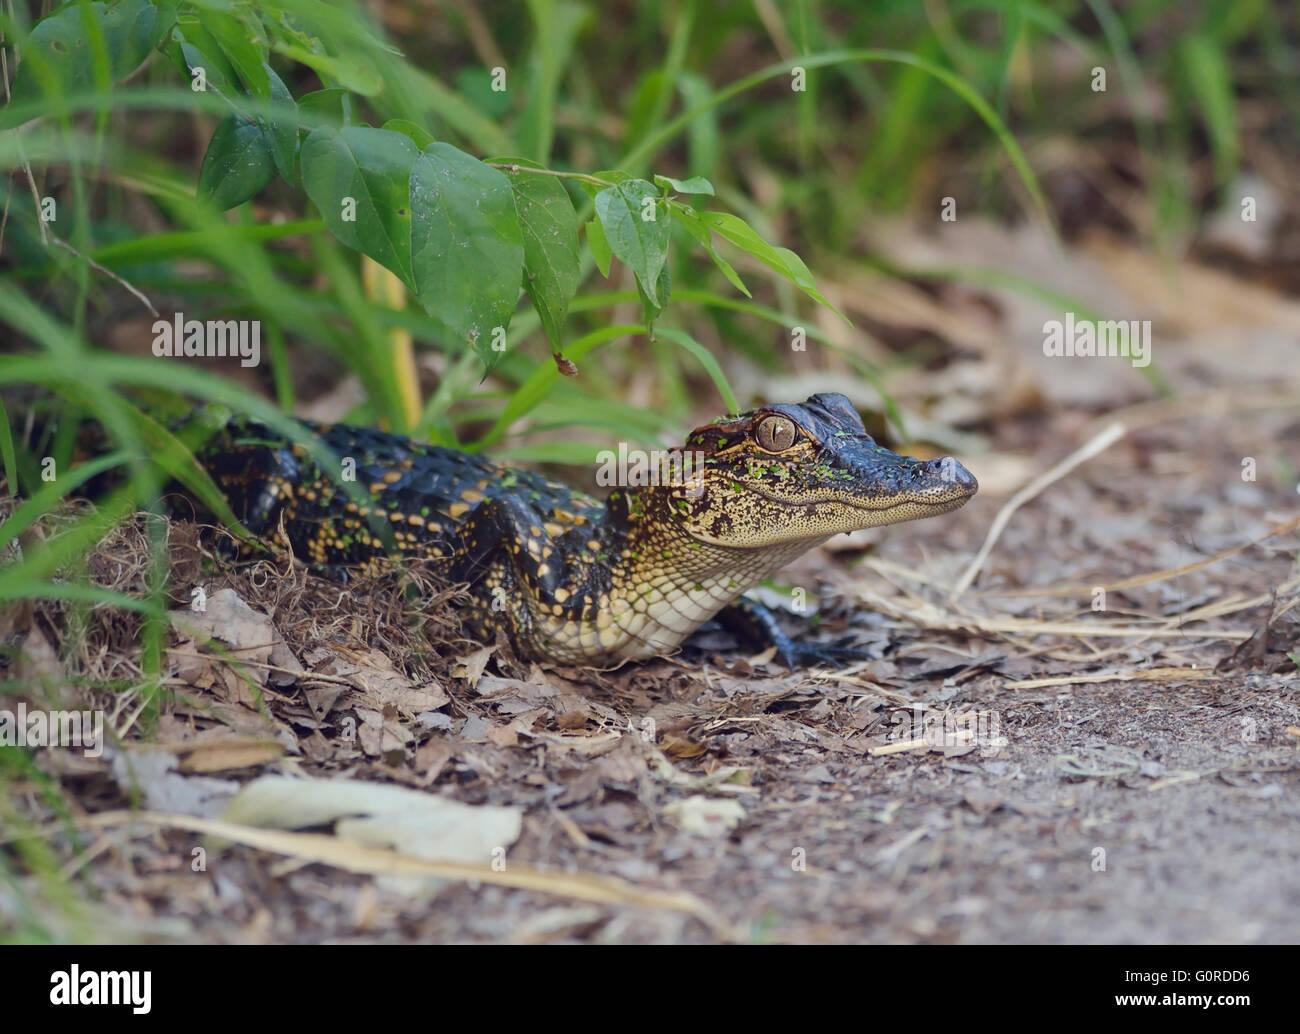 Small Florida Alligator on a Path - Stock Image